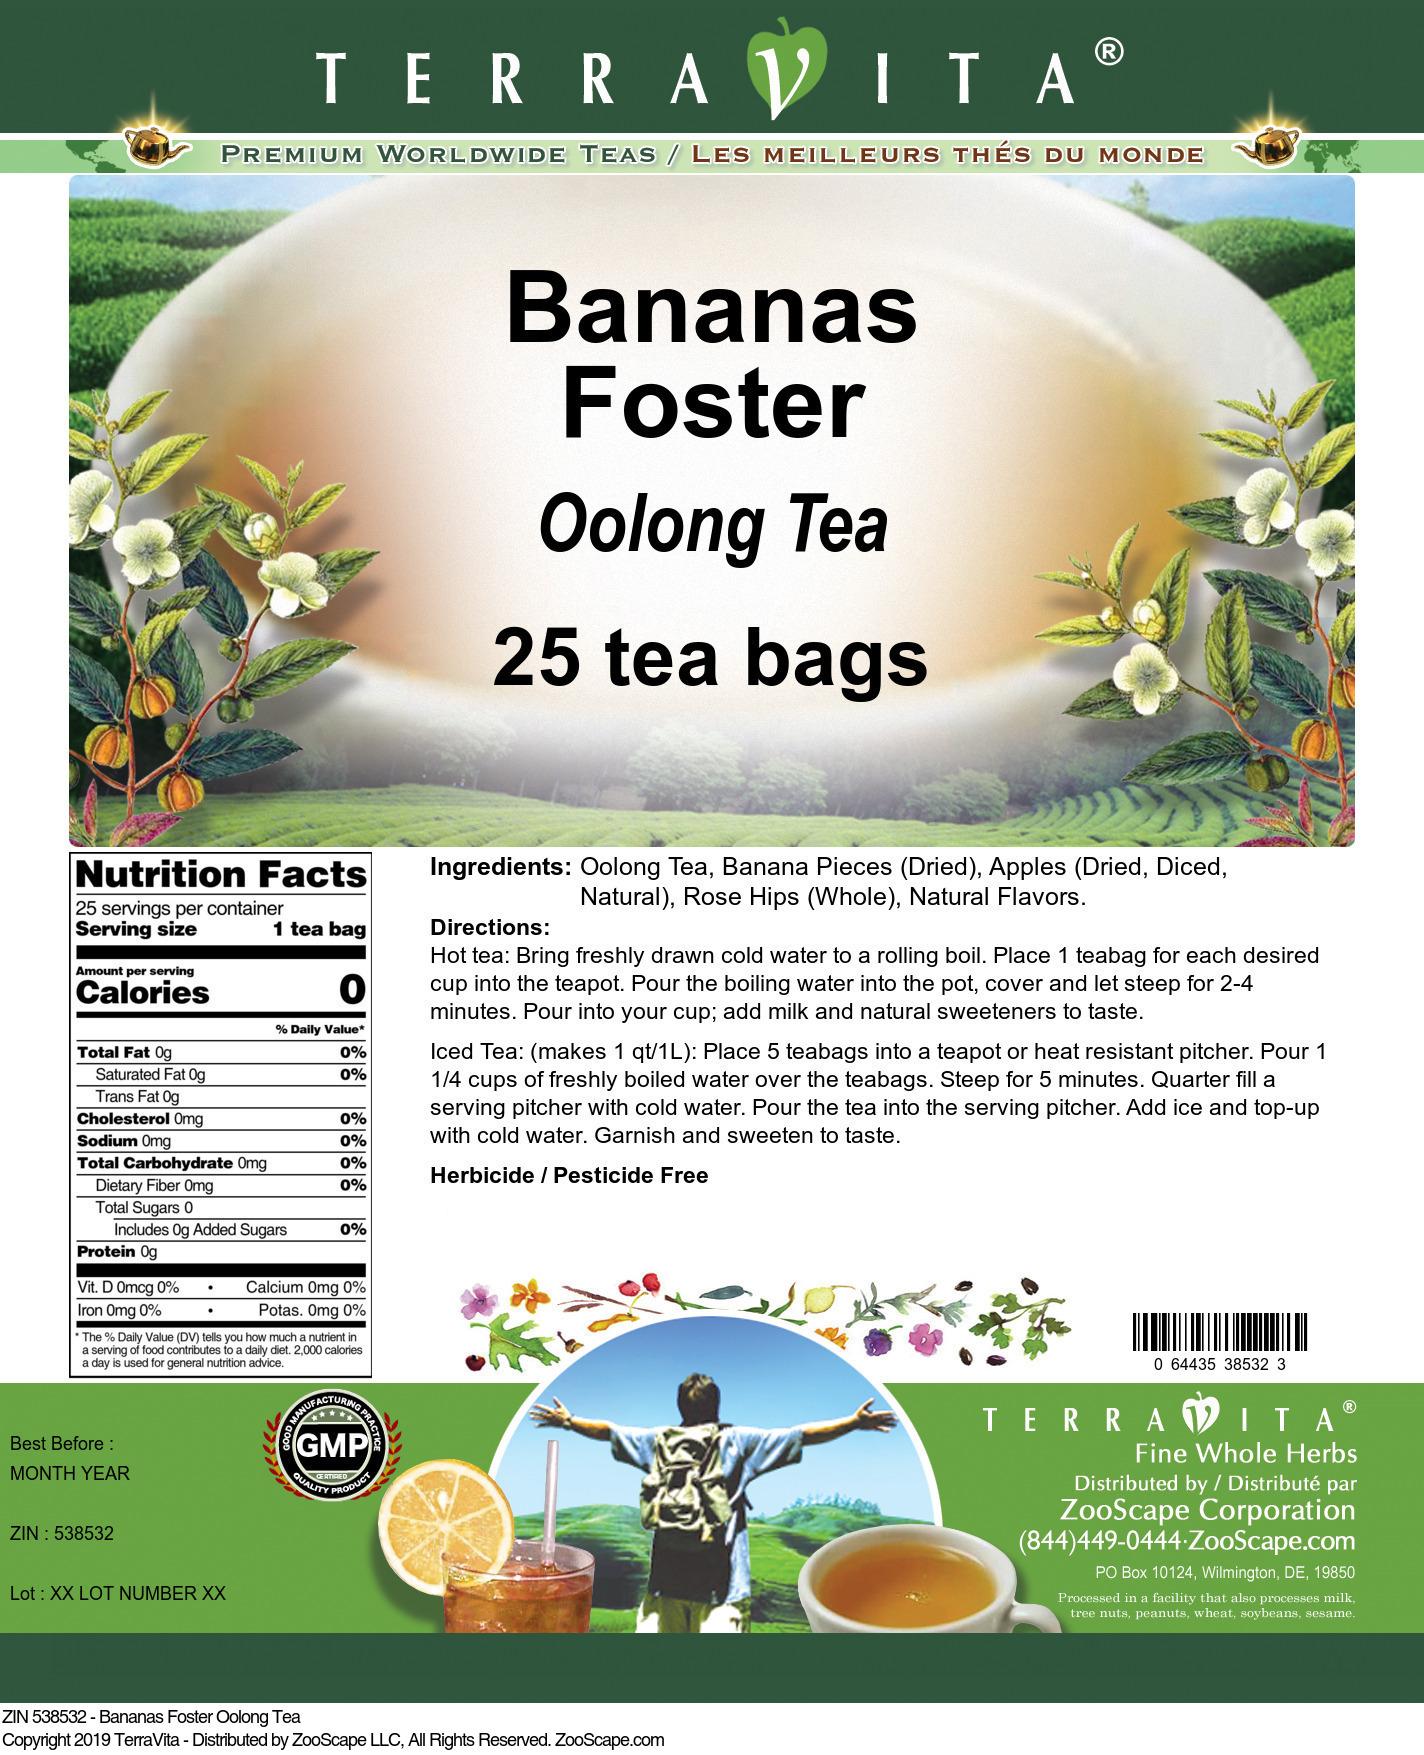 Banana Foster Oolong Tea